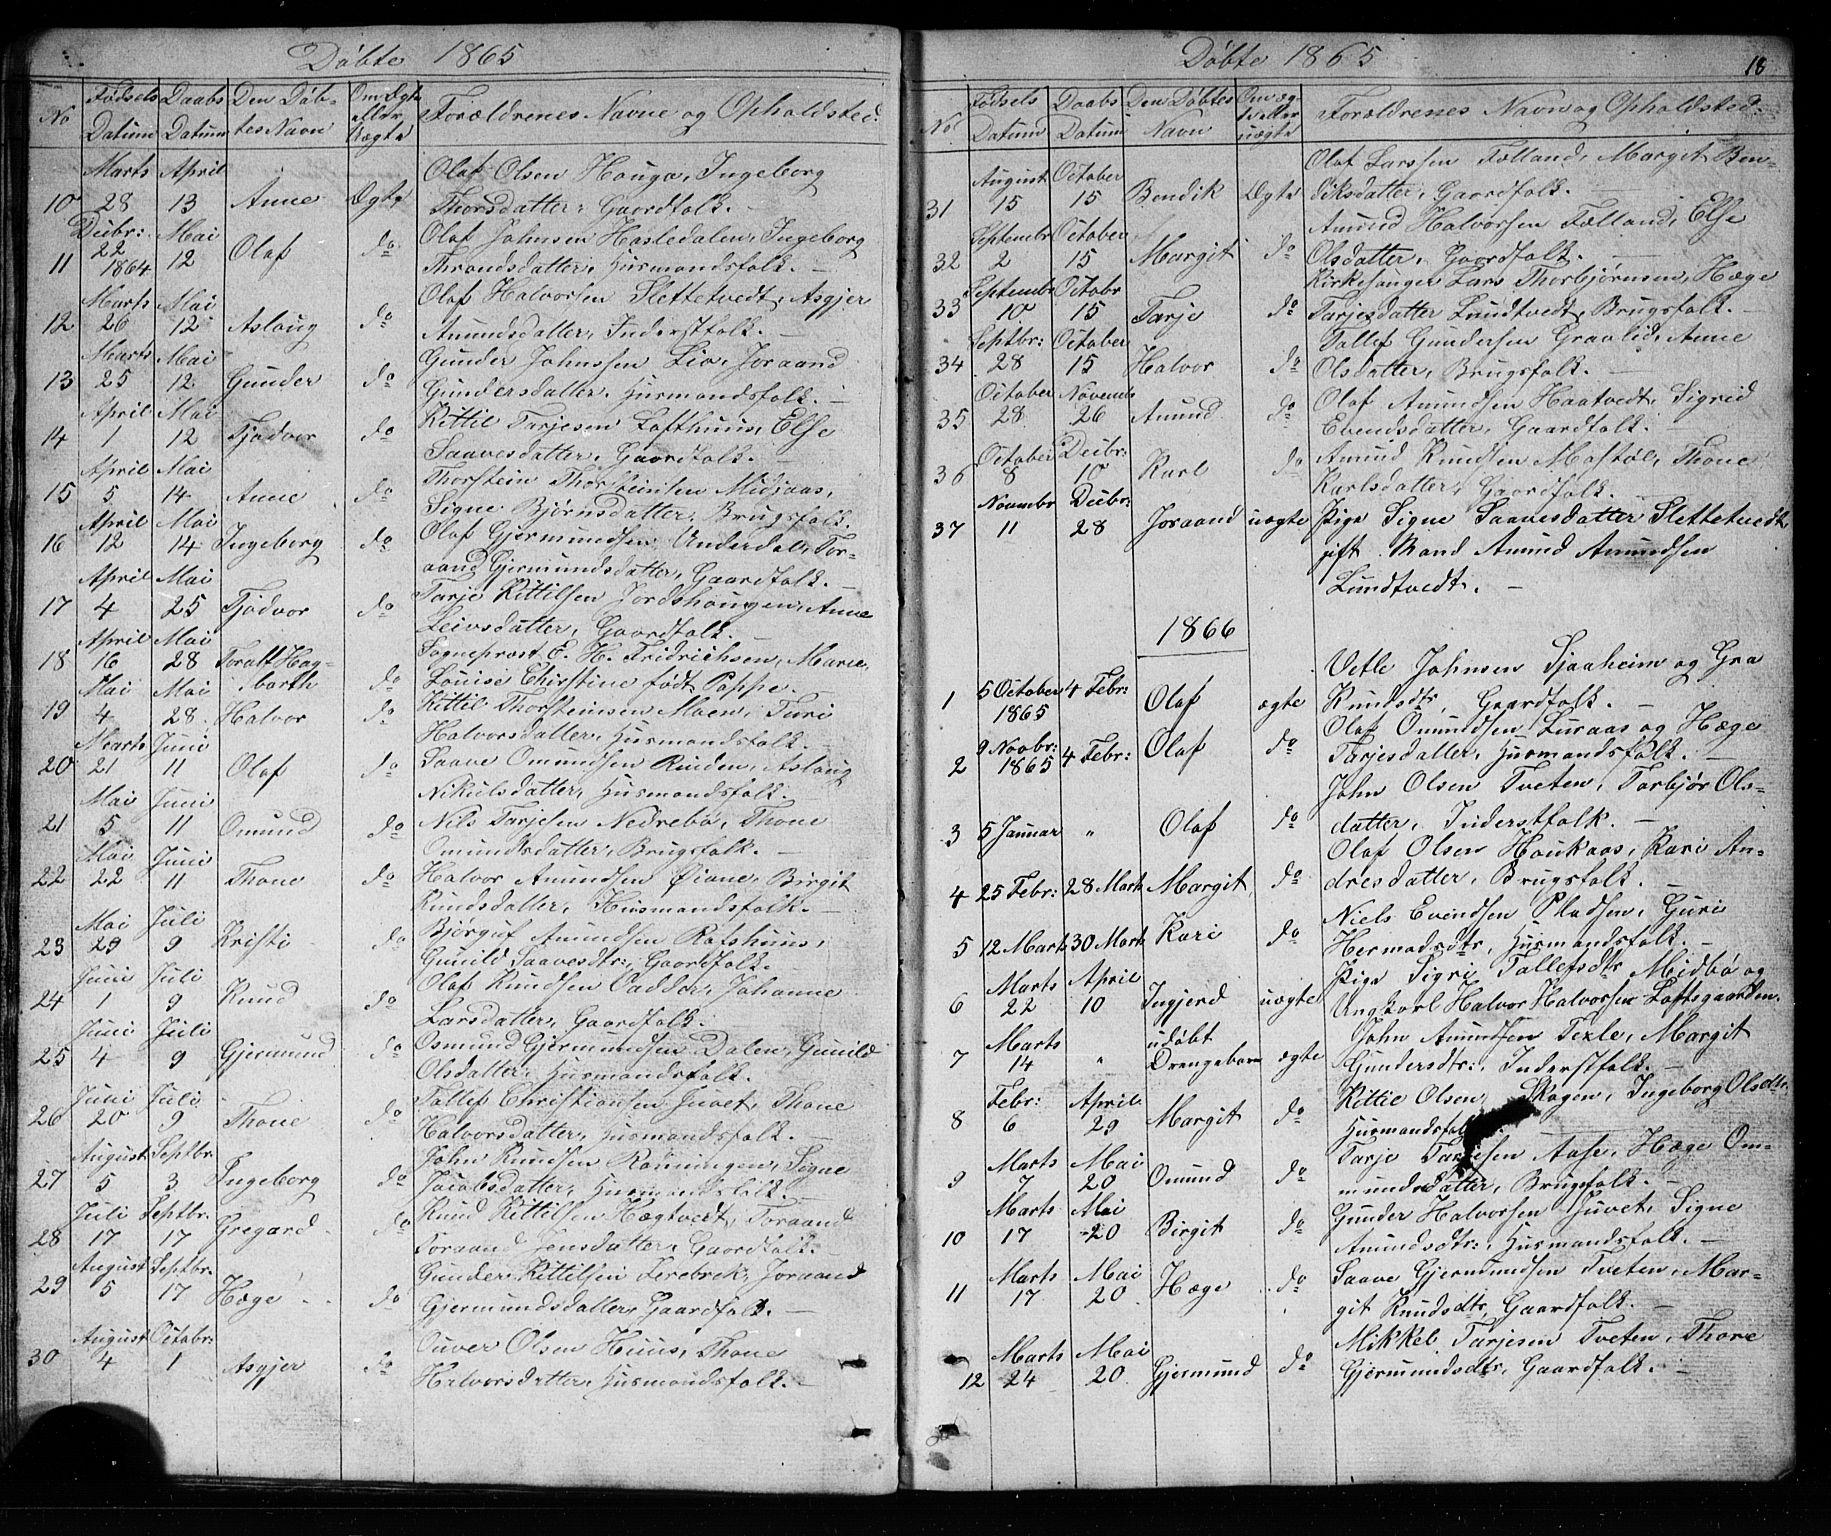 SAKO, Mo kirkebøker, G/Ga/L0001: Klokkerbok nr. I 1, 1851-1891, s. 18